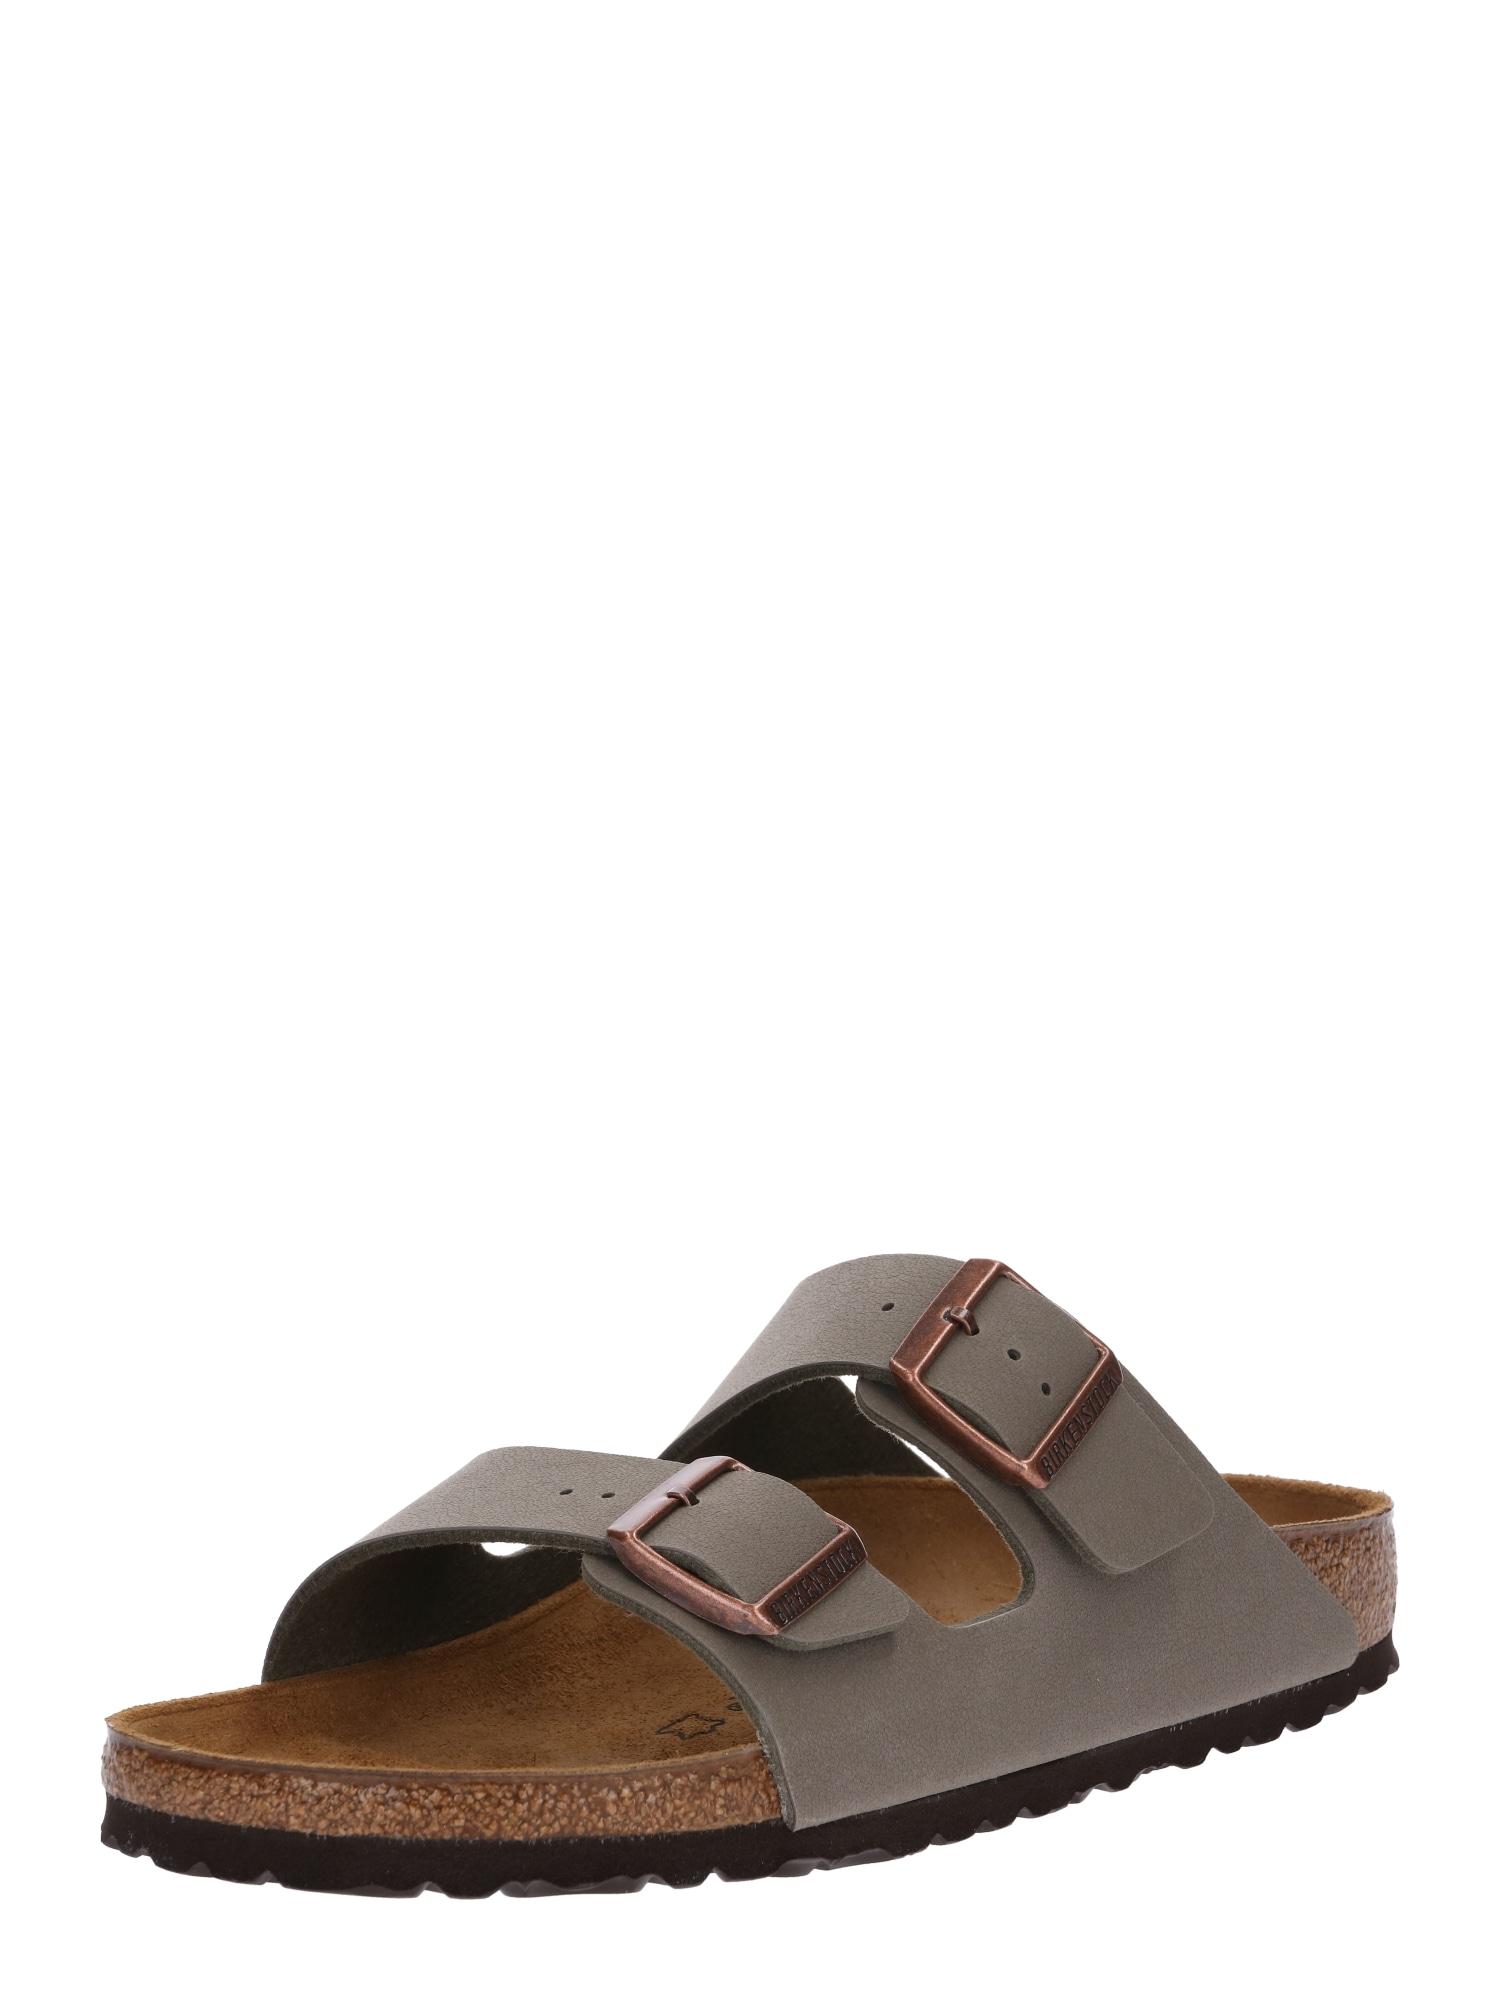 Pantolette 'Arizona'   Schuhe > Clogs & Pantoletten   Birkenstock